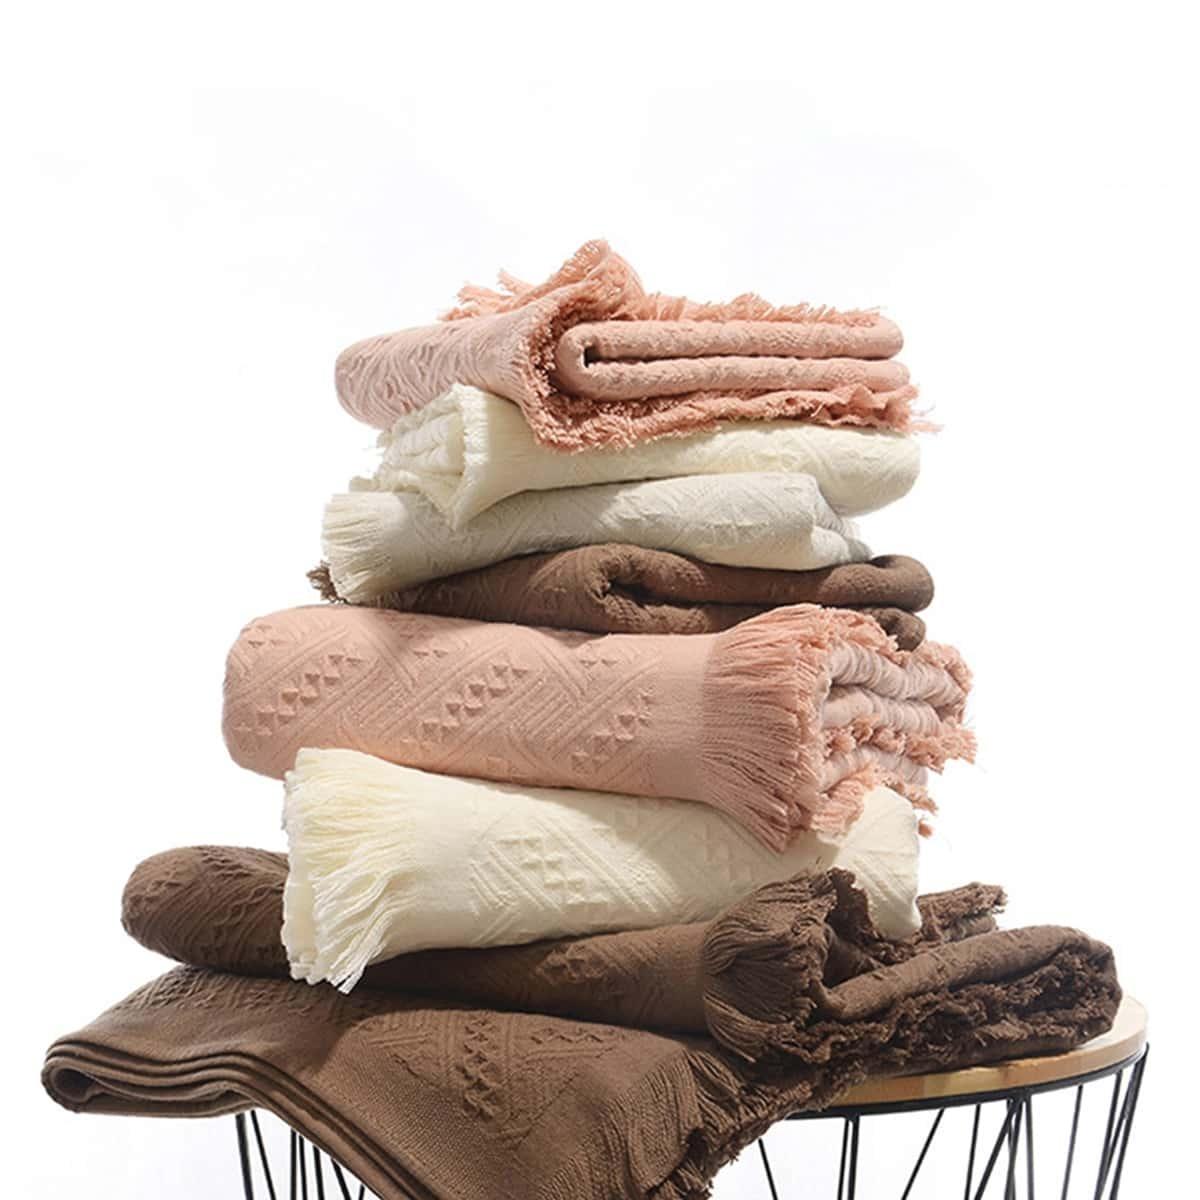 Kwastjes detail handdoek 1pc